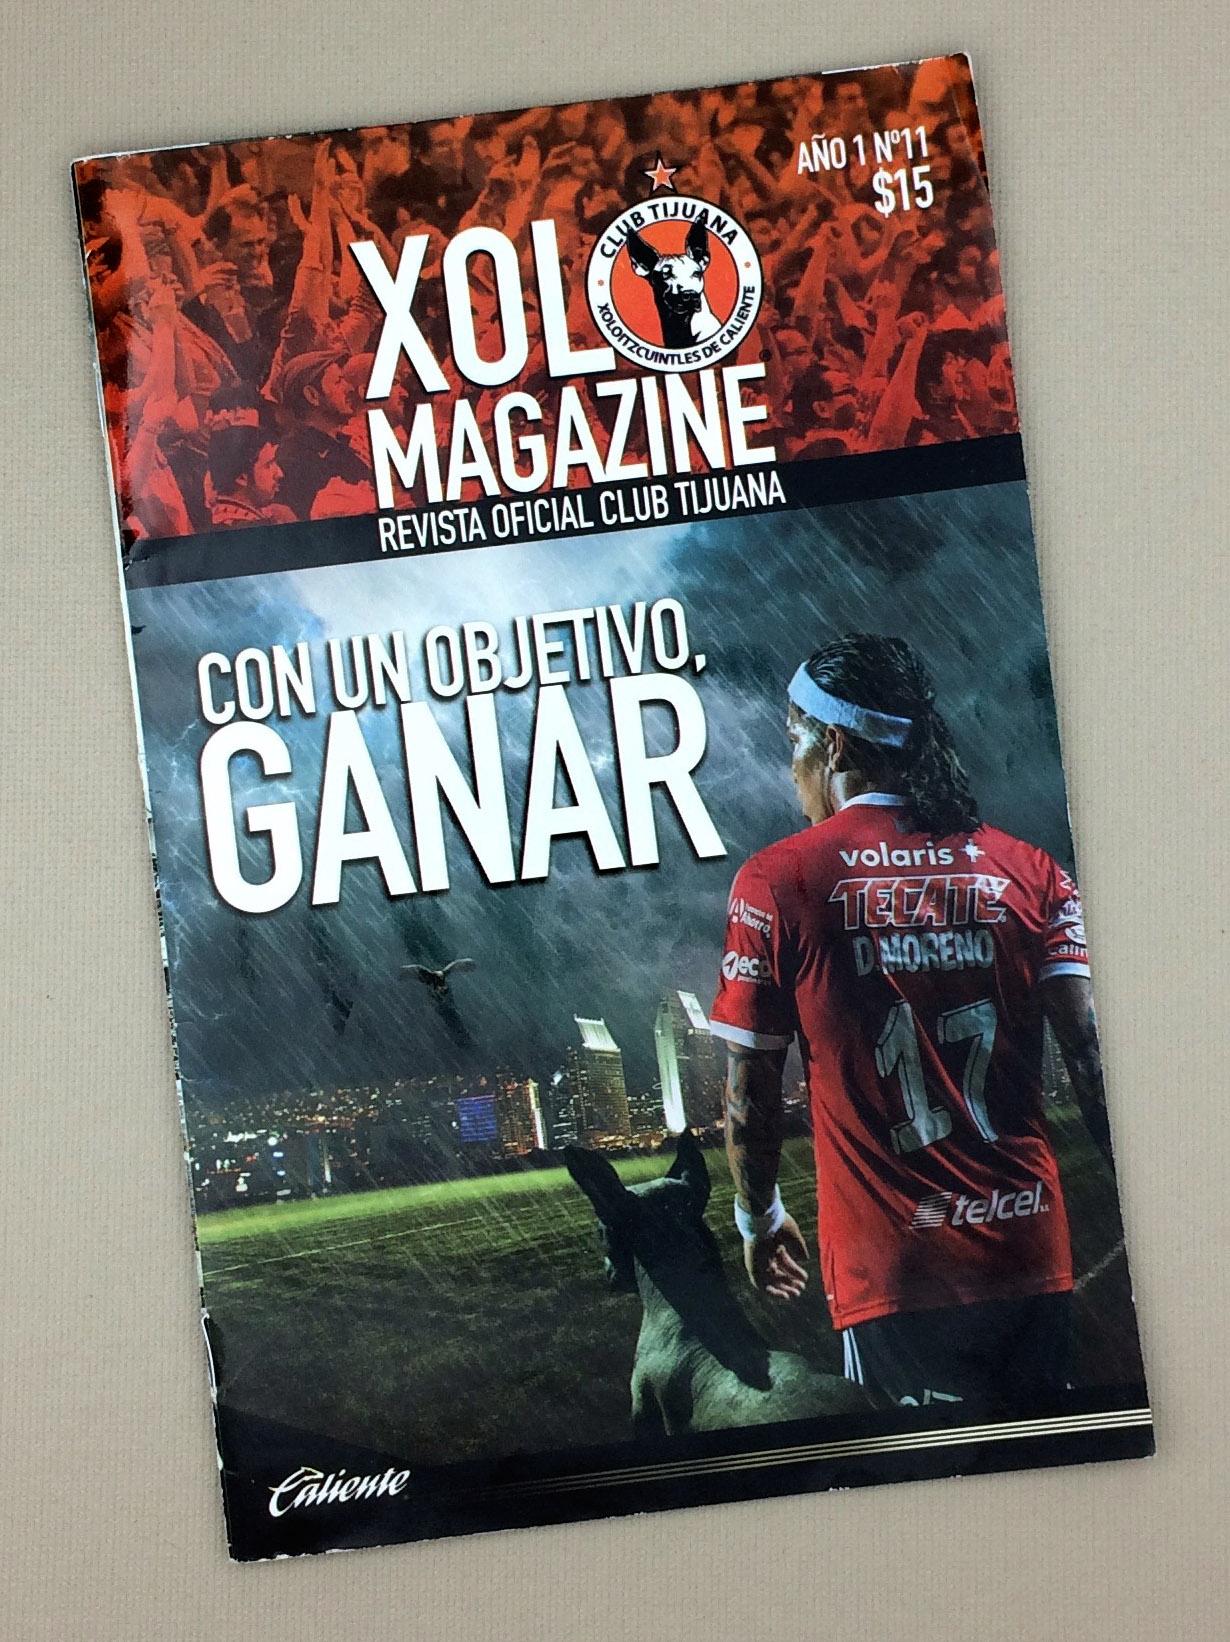 Xolos Magazine 2015 Año 1 No. 11